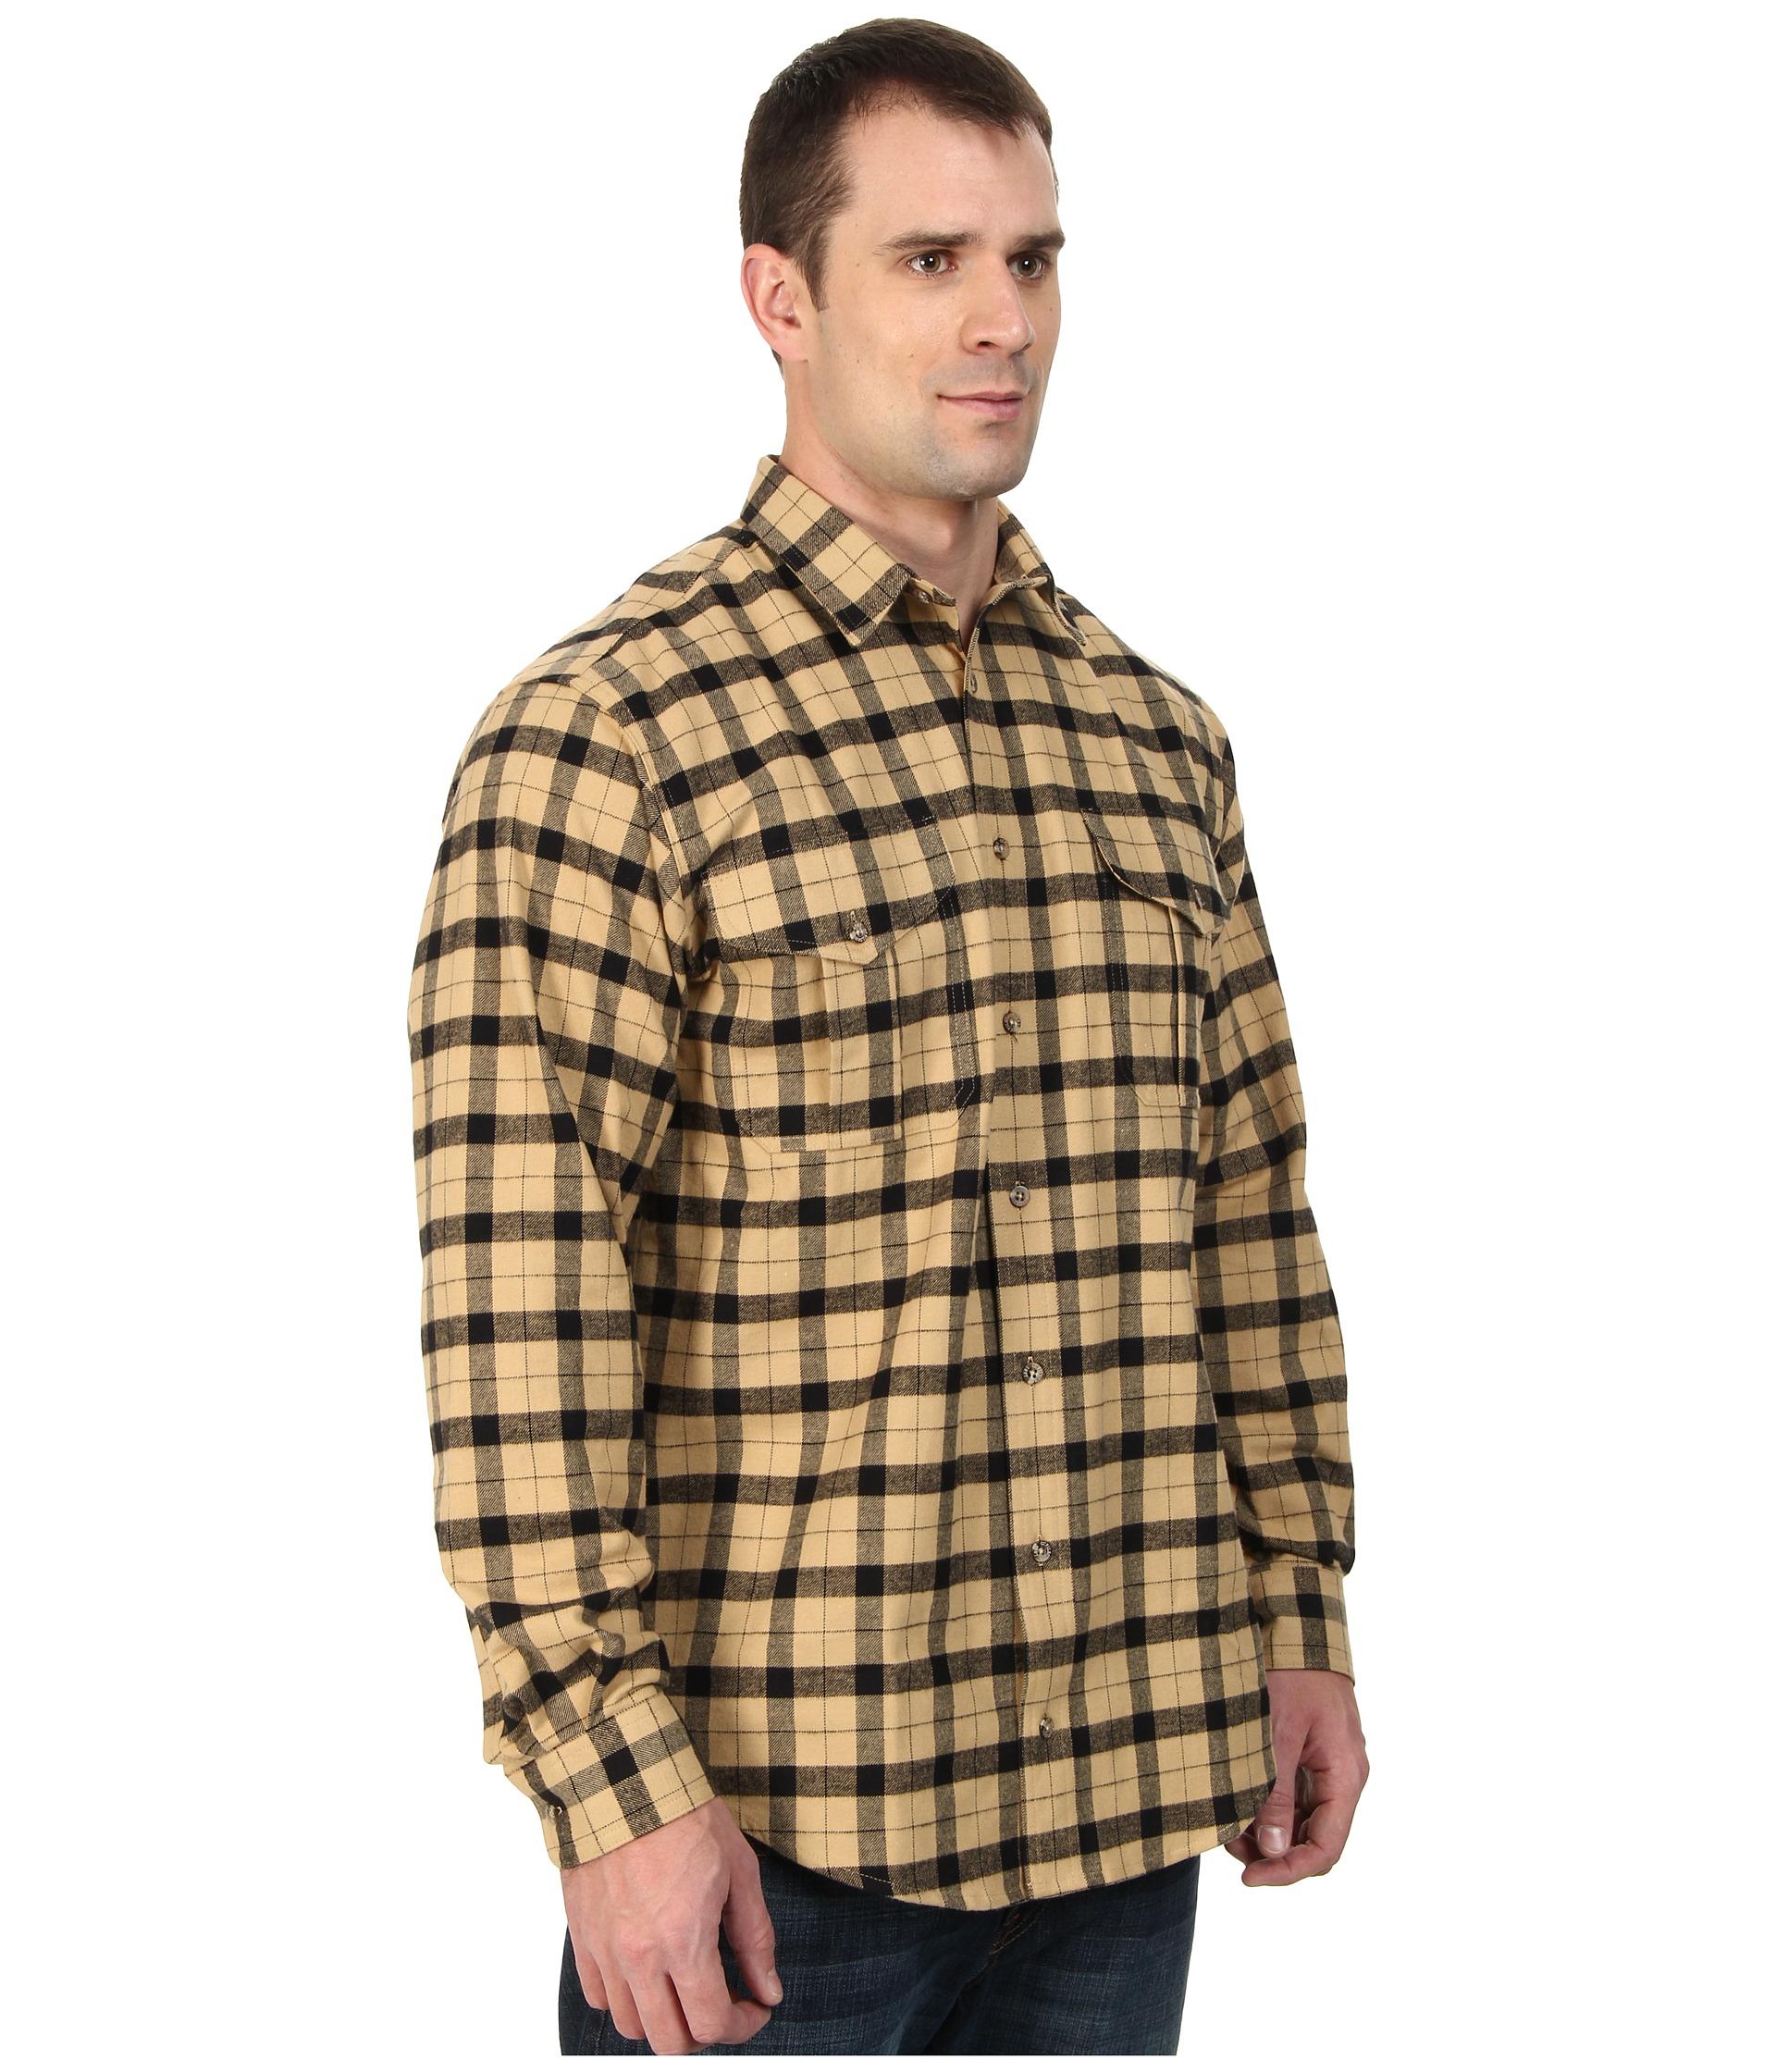 Filson extra long alaskan guide shirt in natural for men for Extra long mens dress shirts